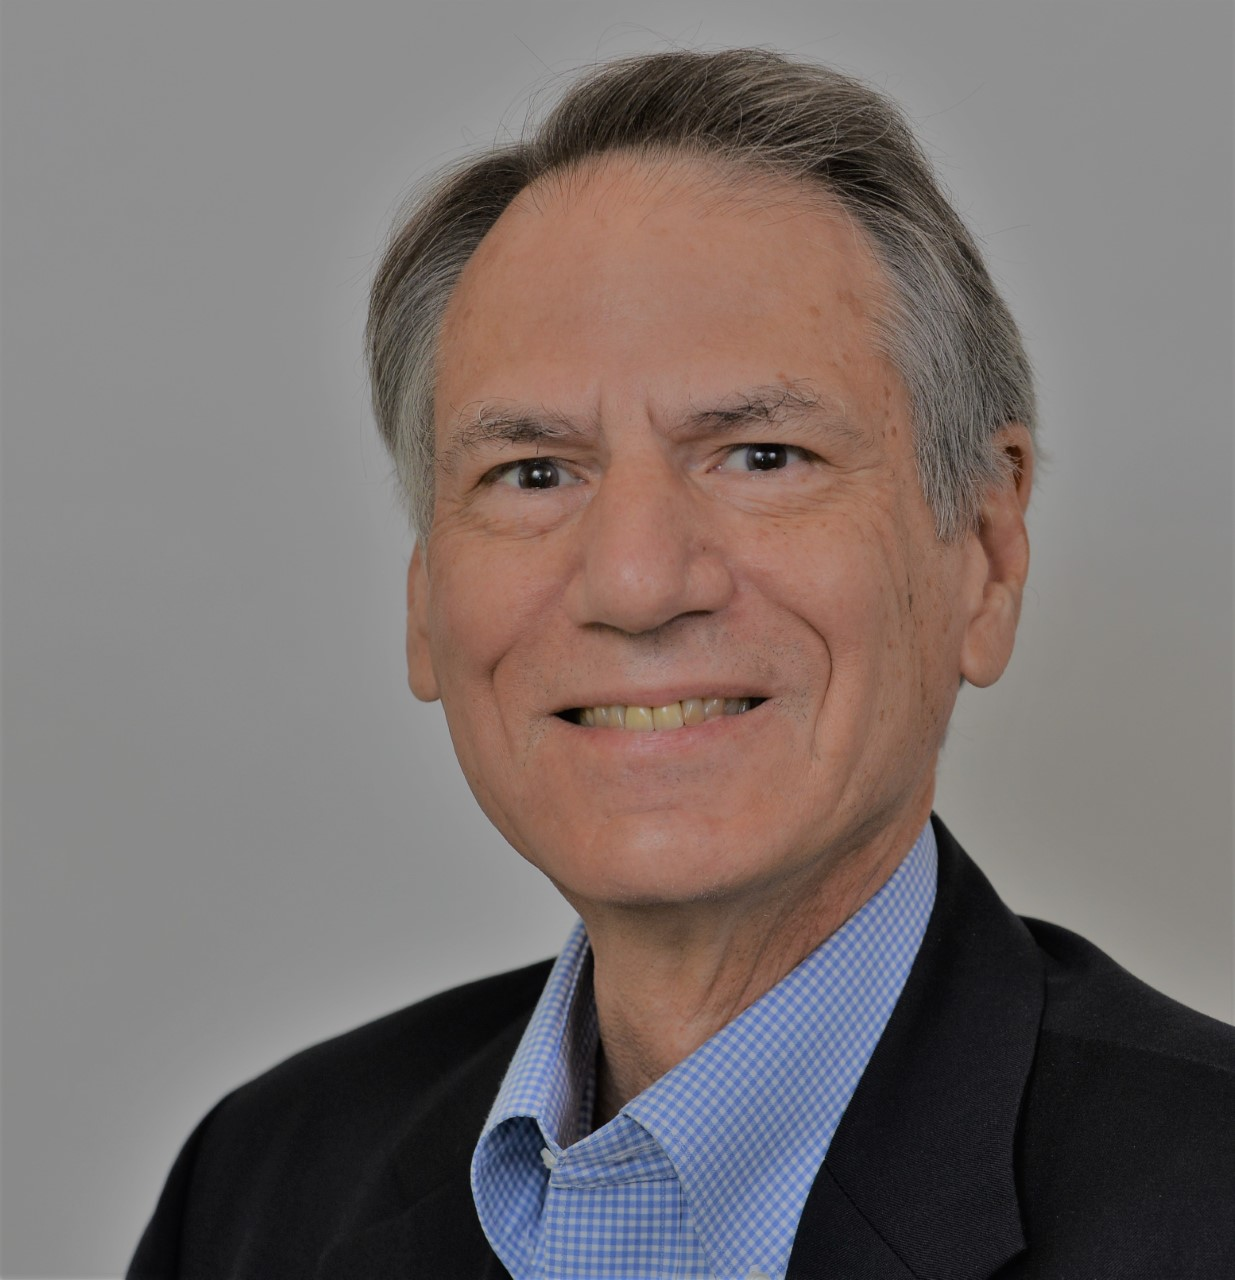 Marketing Professor Lawrence Marks